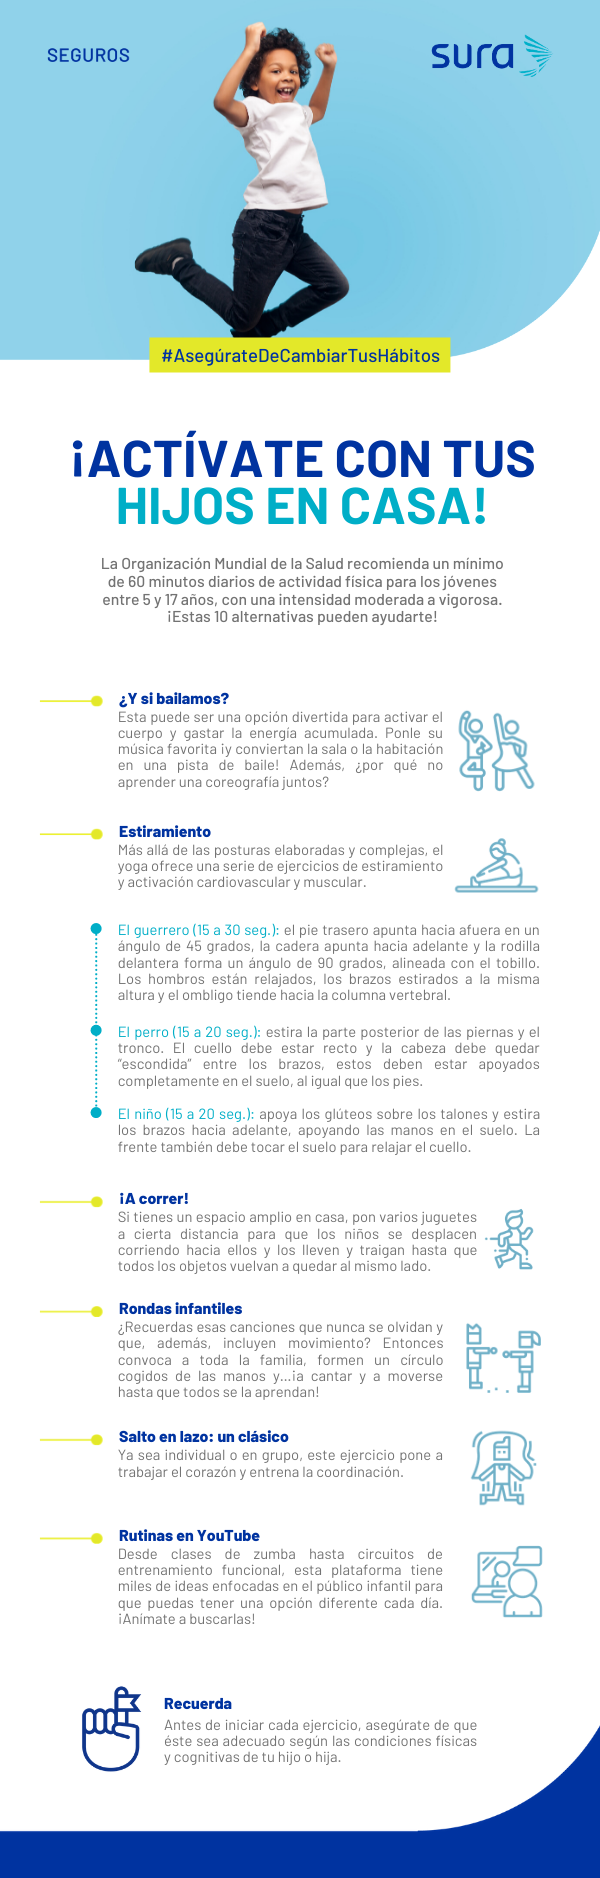 Infografía - Actívate hijos casa